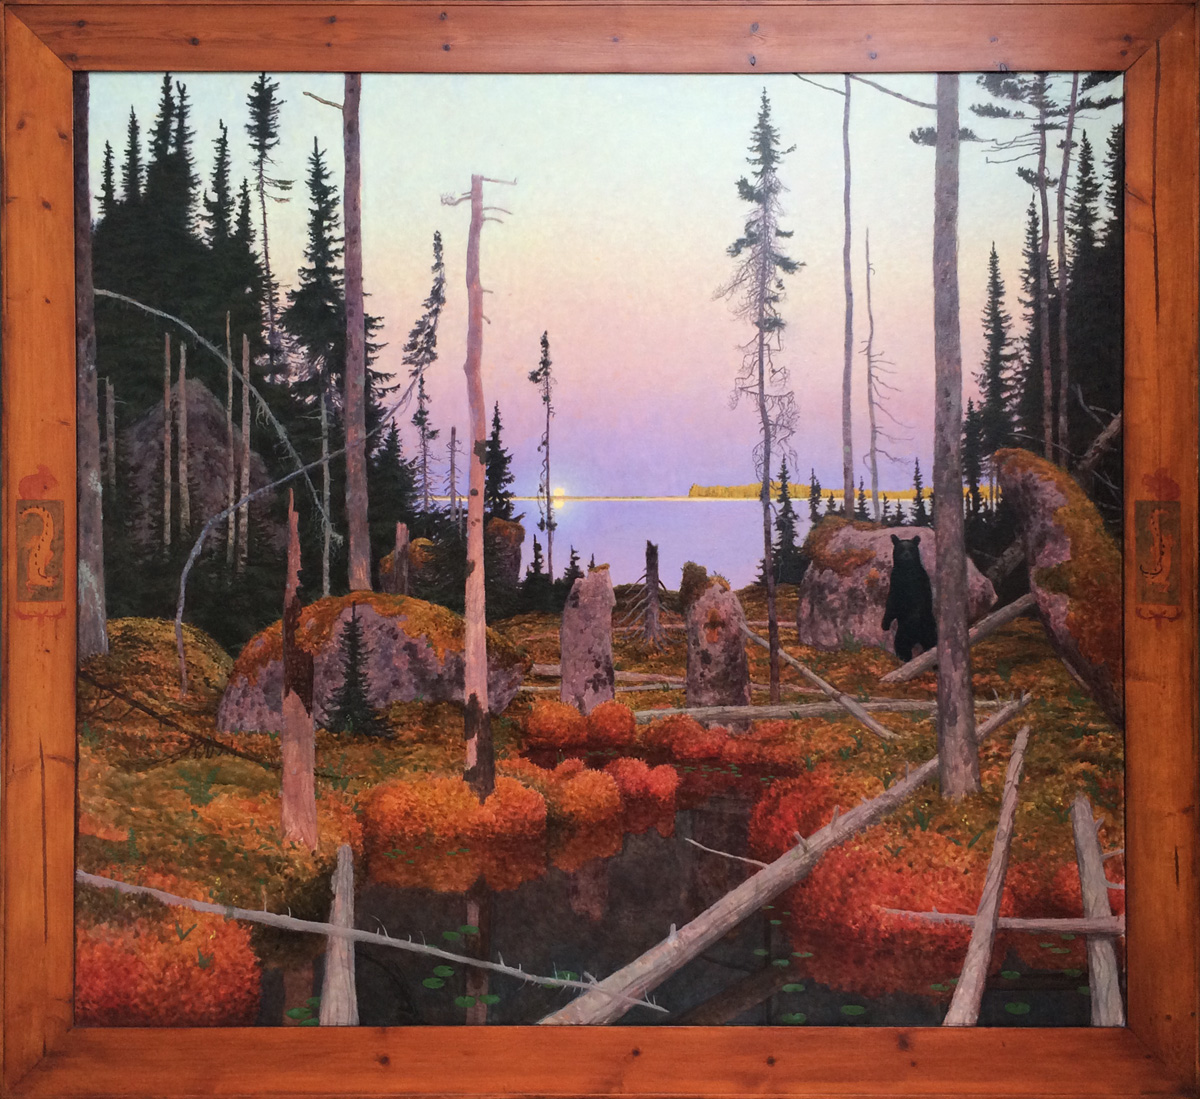 "NIND ANAMIE-WIDOKAWA (842), Oil on Linen, 57 x 61"""